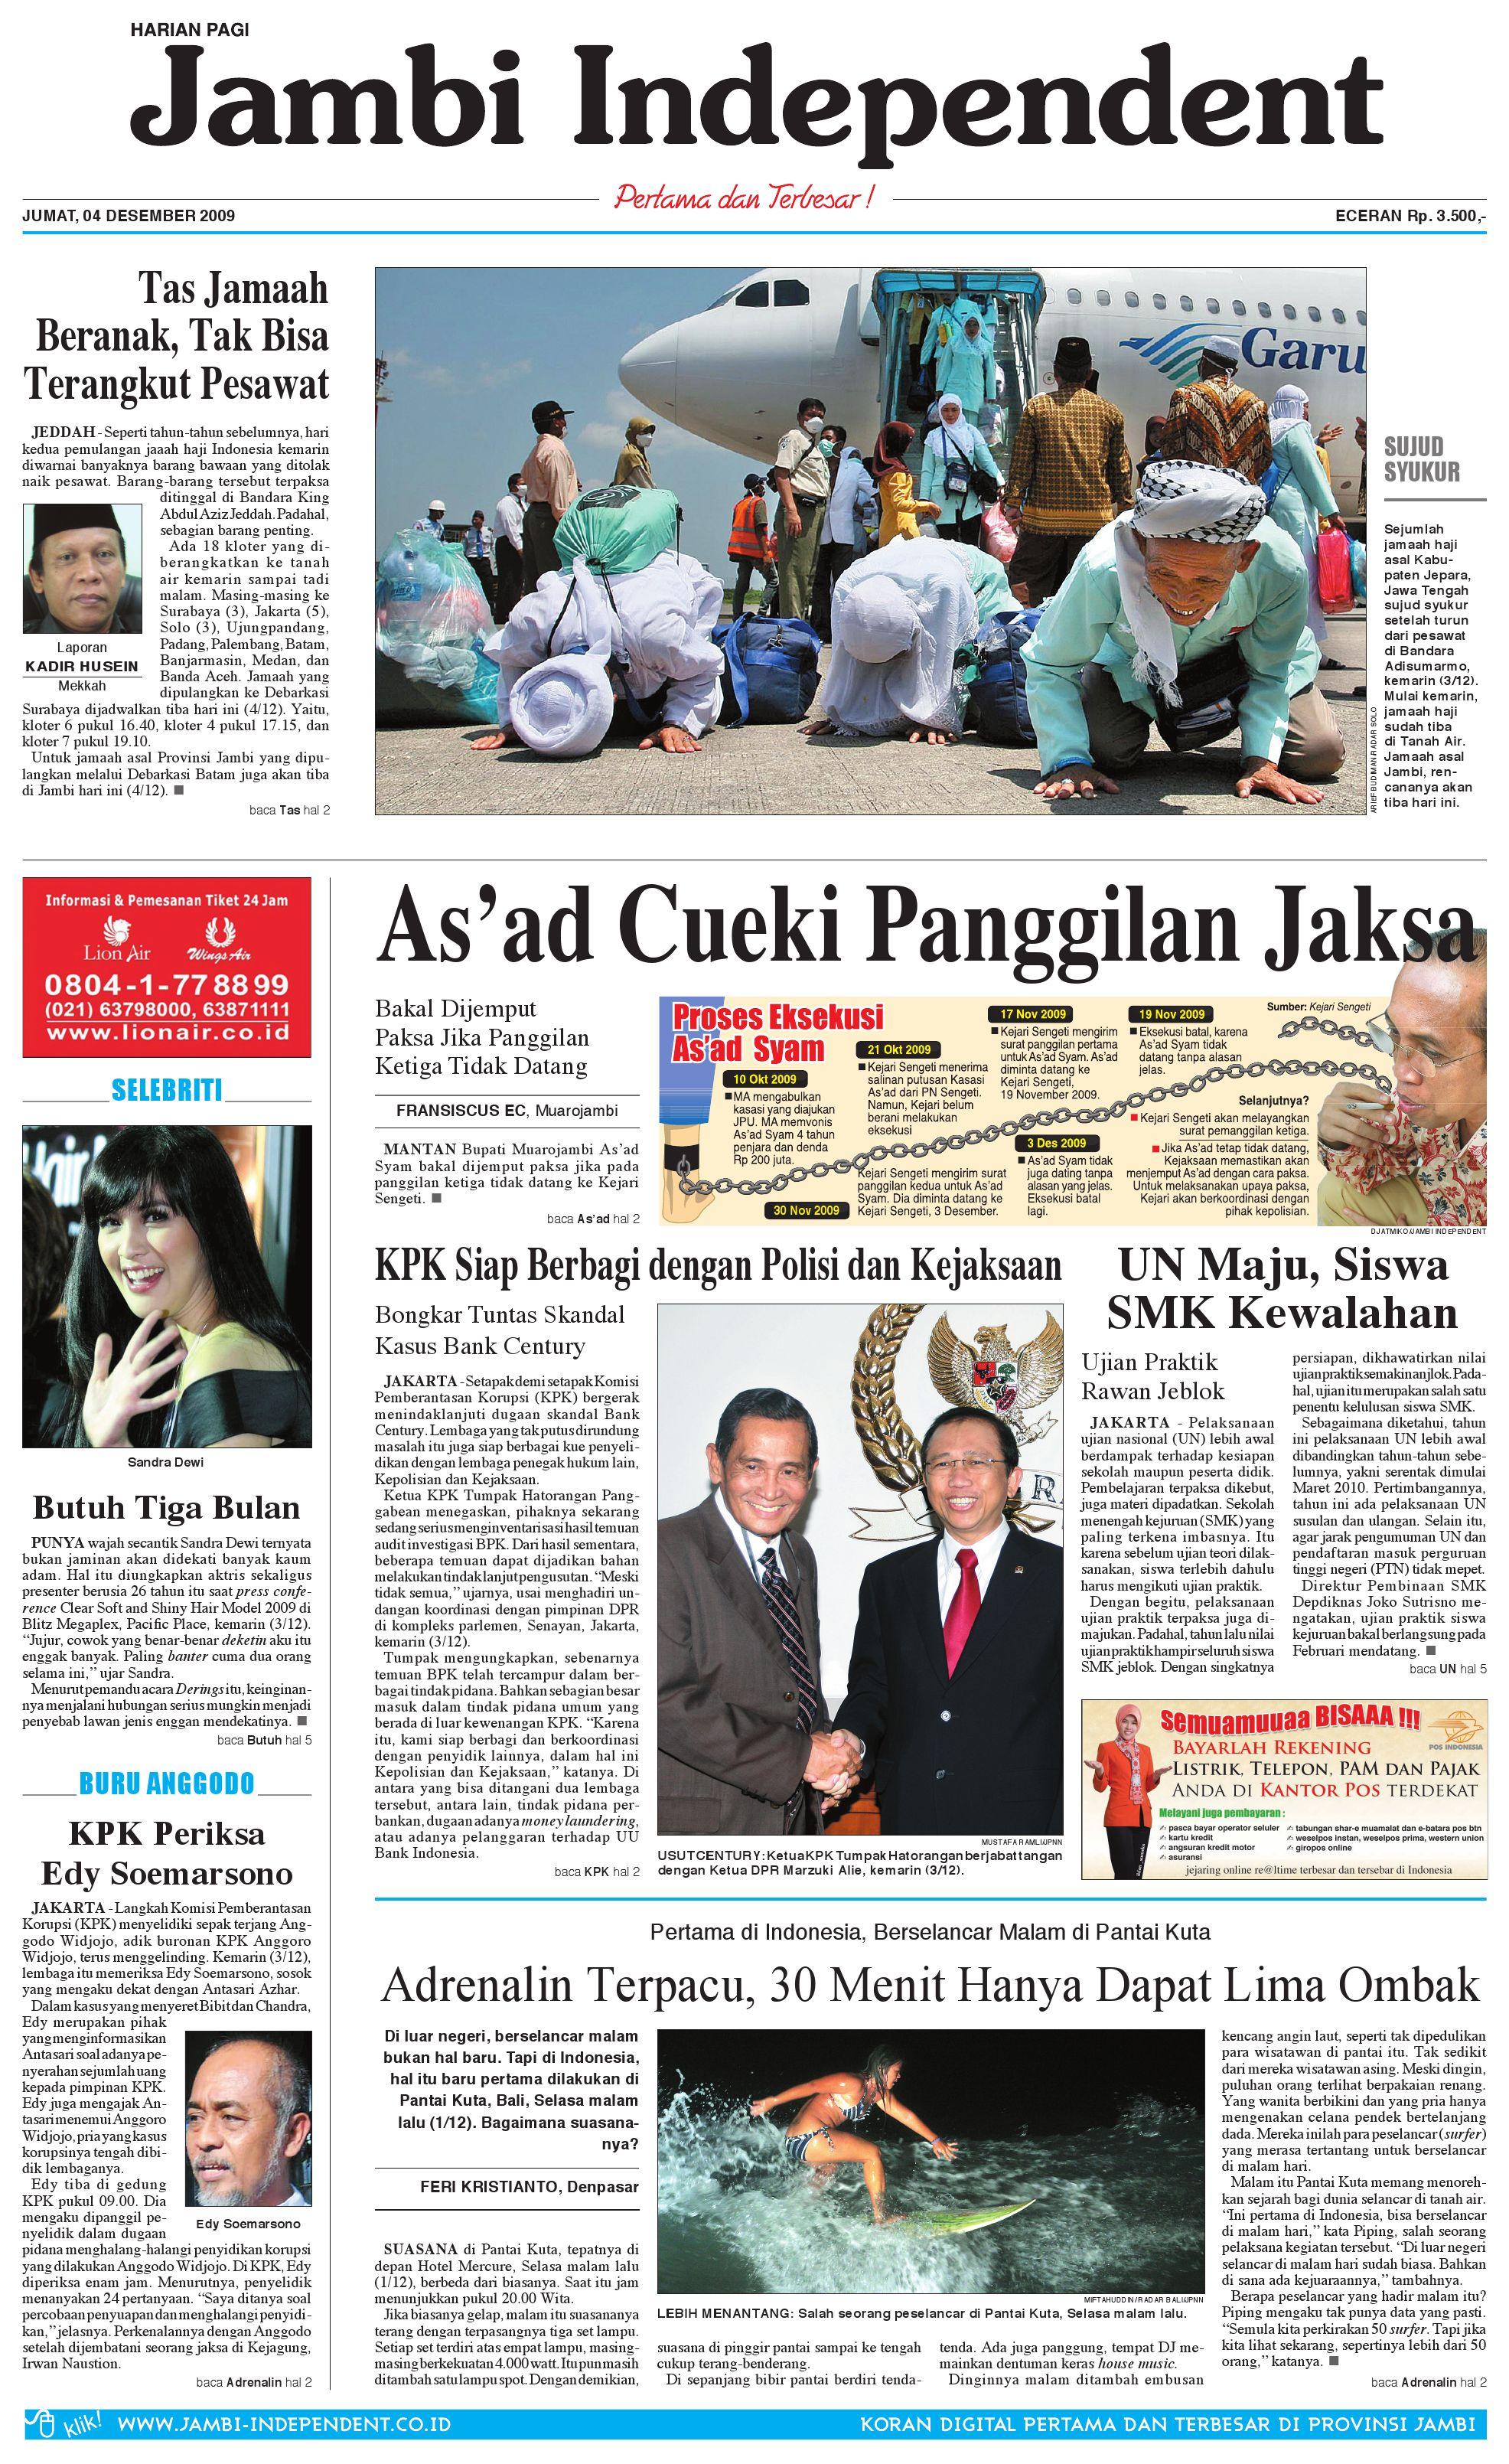 Jambi Independent 04 Desember 2009 By Issuu Produk Ukm Bumn Tekiro Tang Kombinasi 7